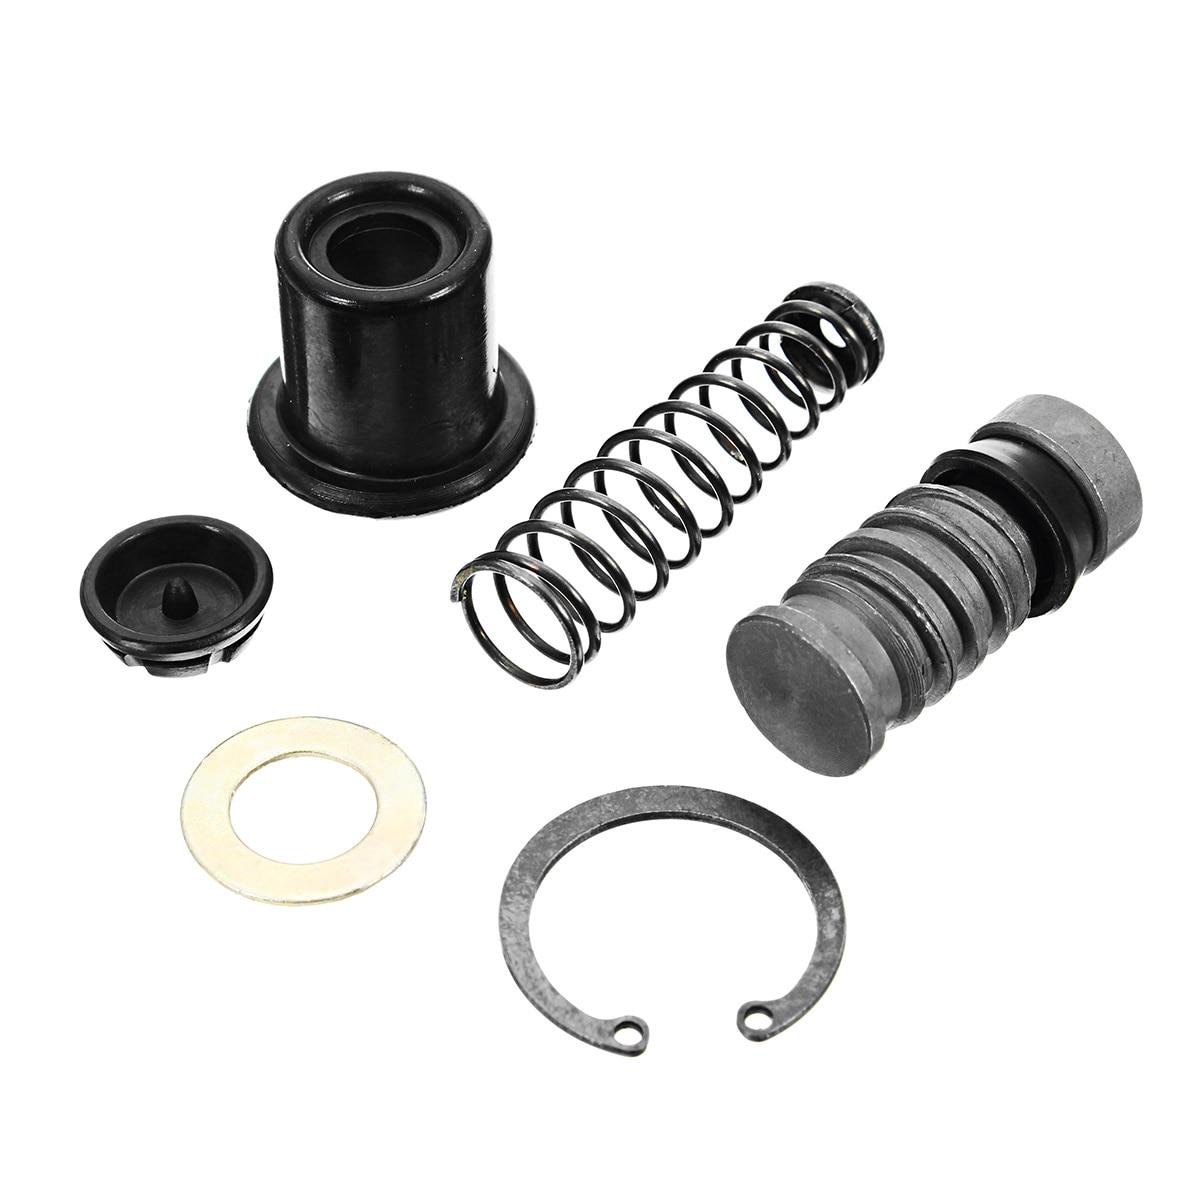 Brake-Pump Piston Plunger Master-Cylinder-Piston Repair-Kits Motorcycle Clutch Motocross/scooter